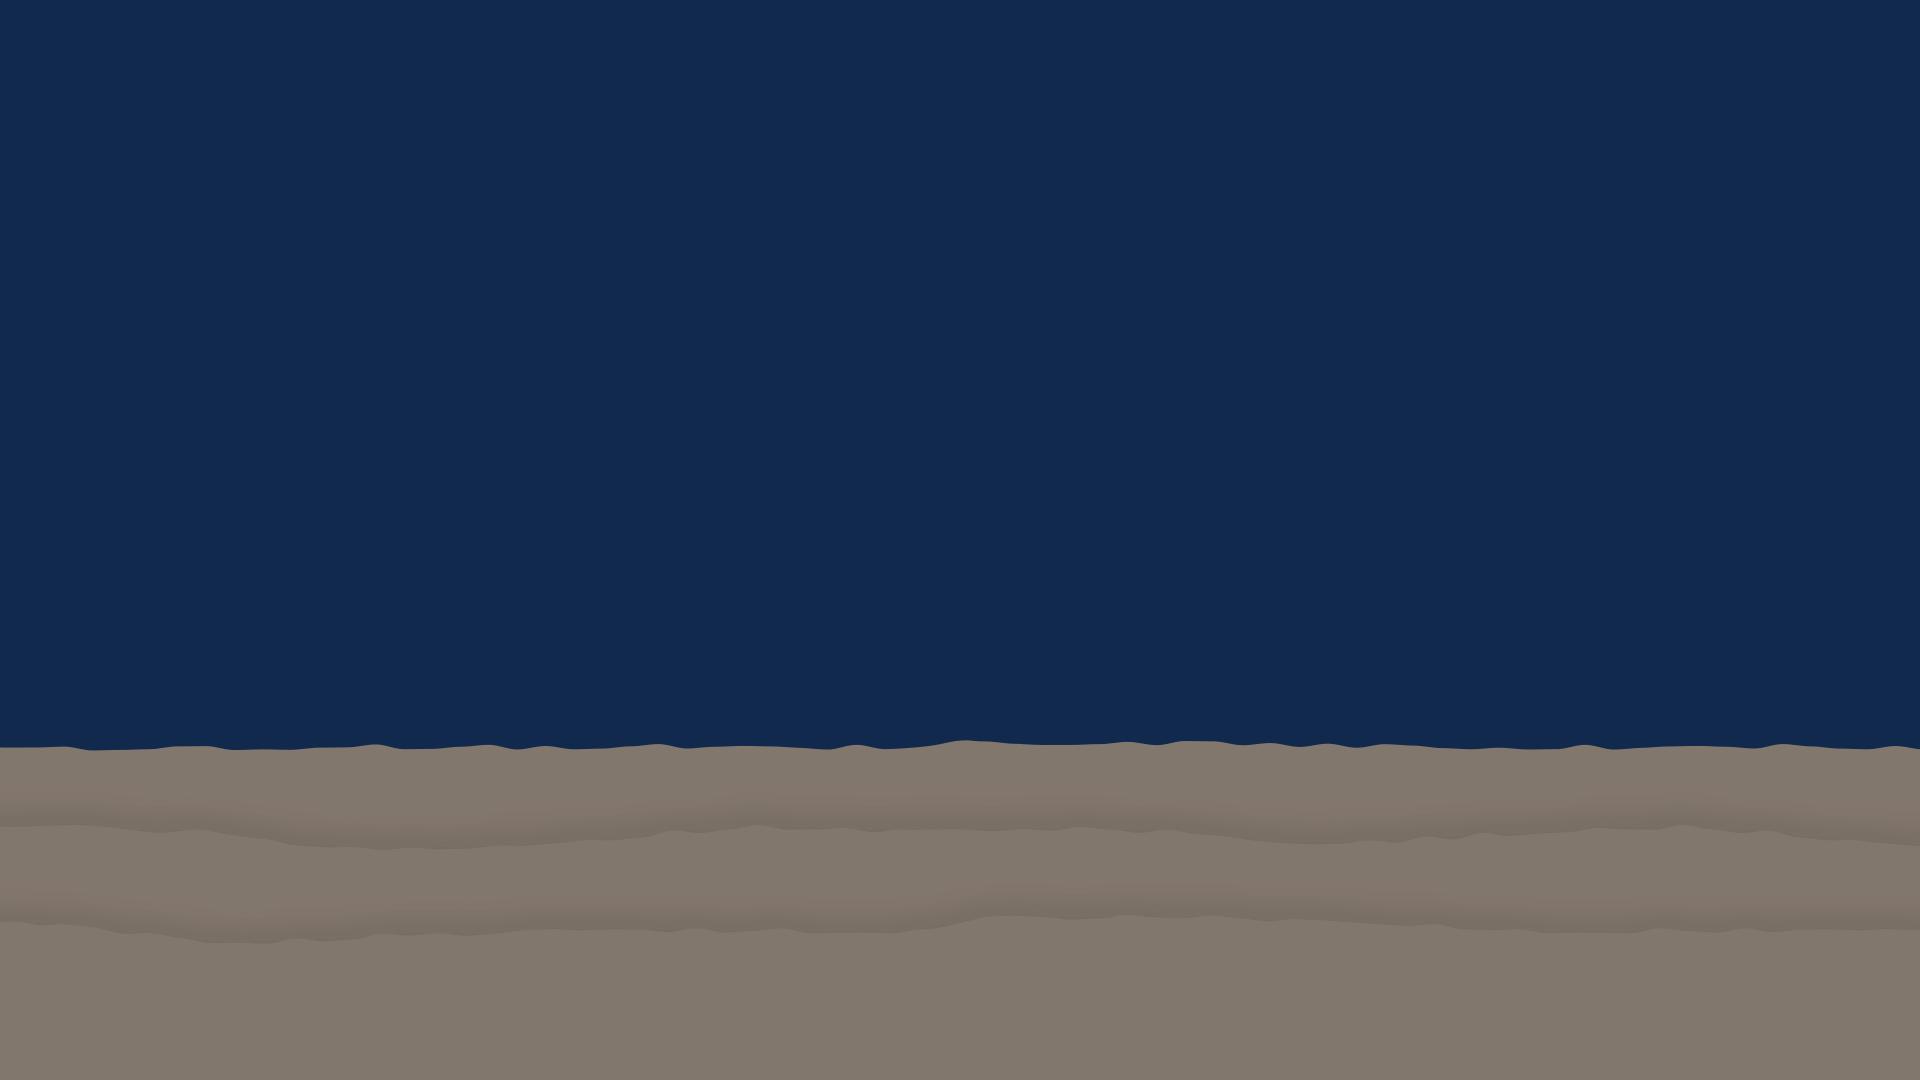 Noire Background